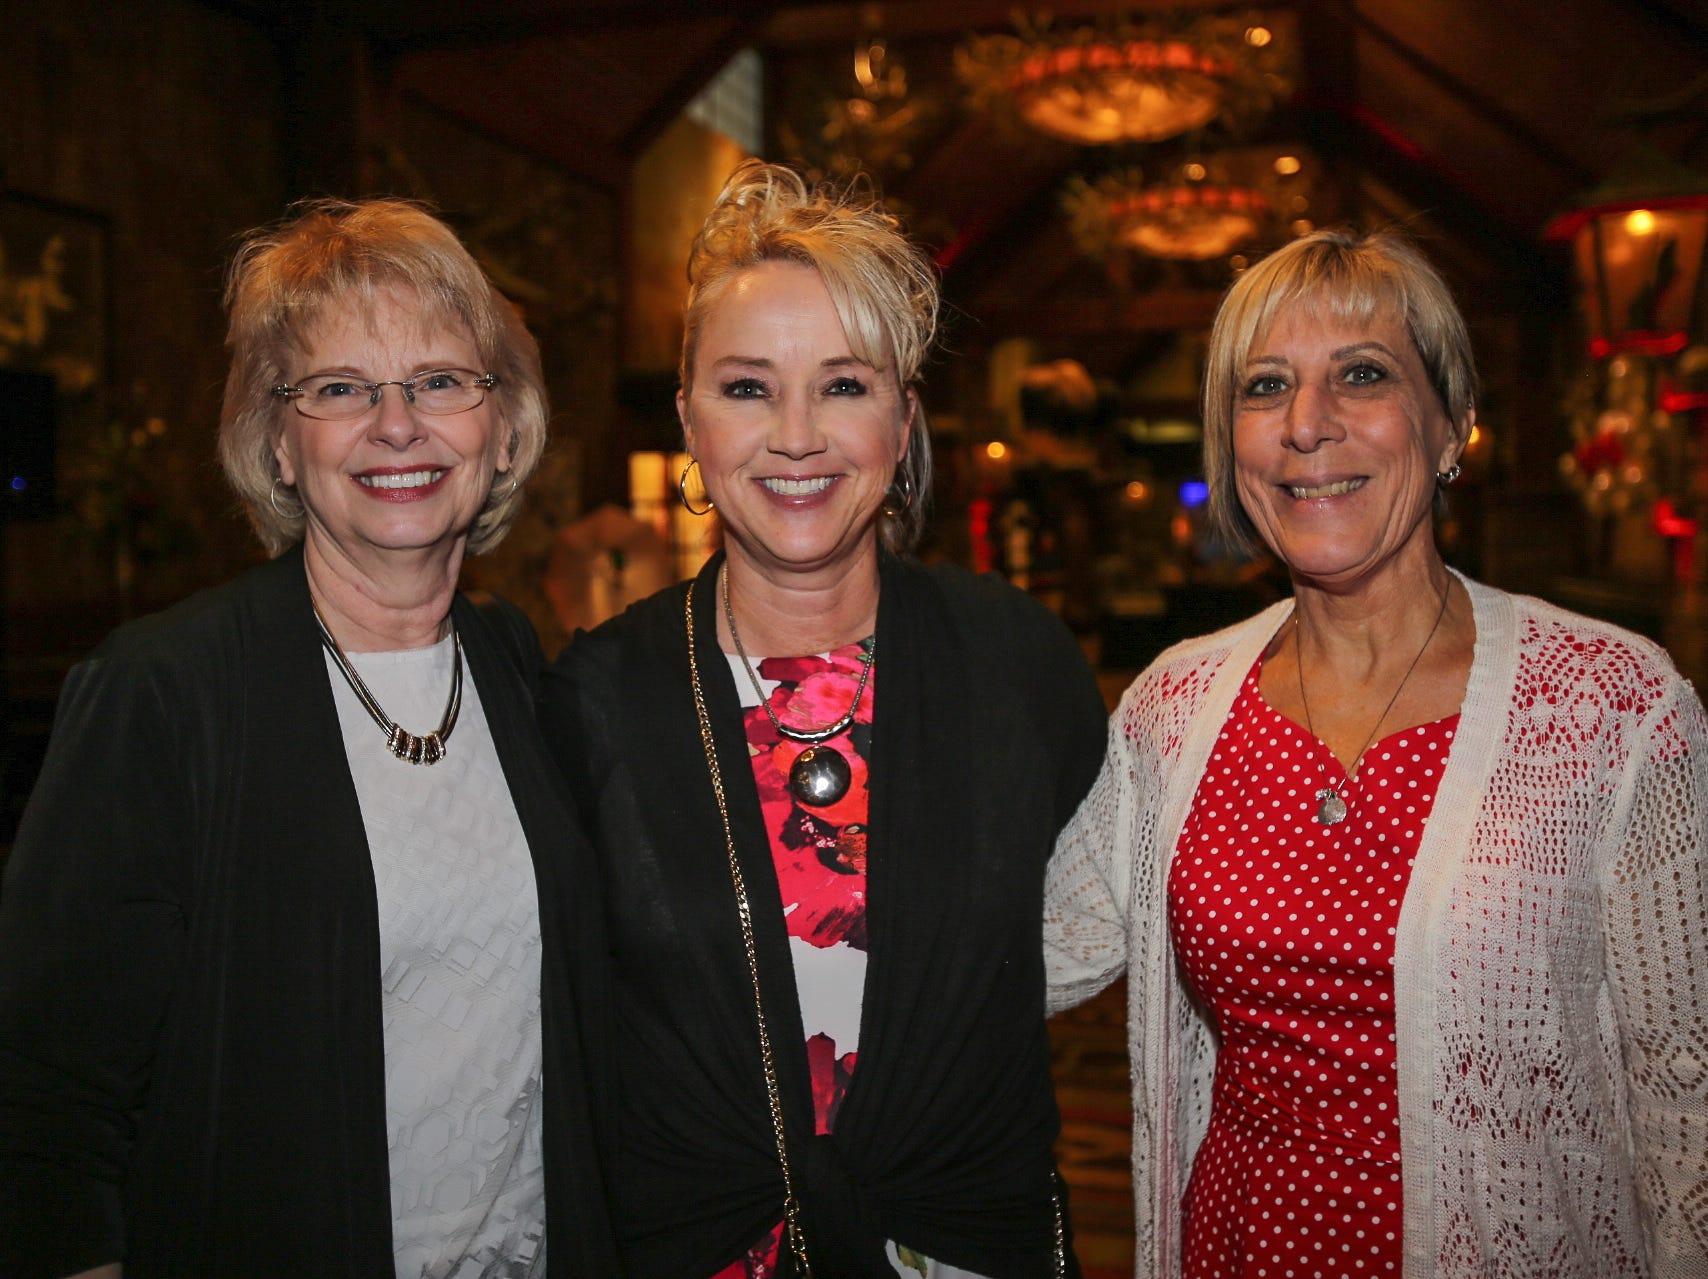 Debbie Corlett, Lisa Vest, and Kim Woll